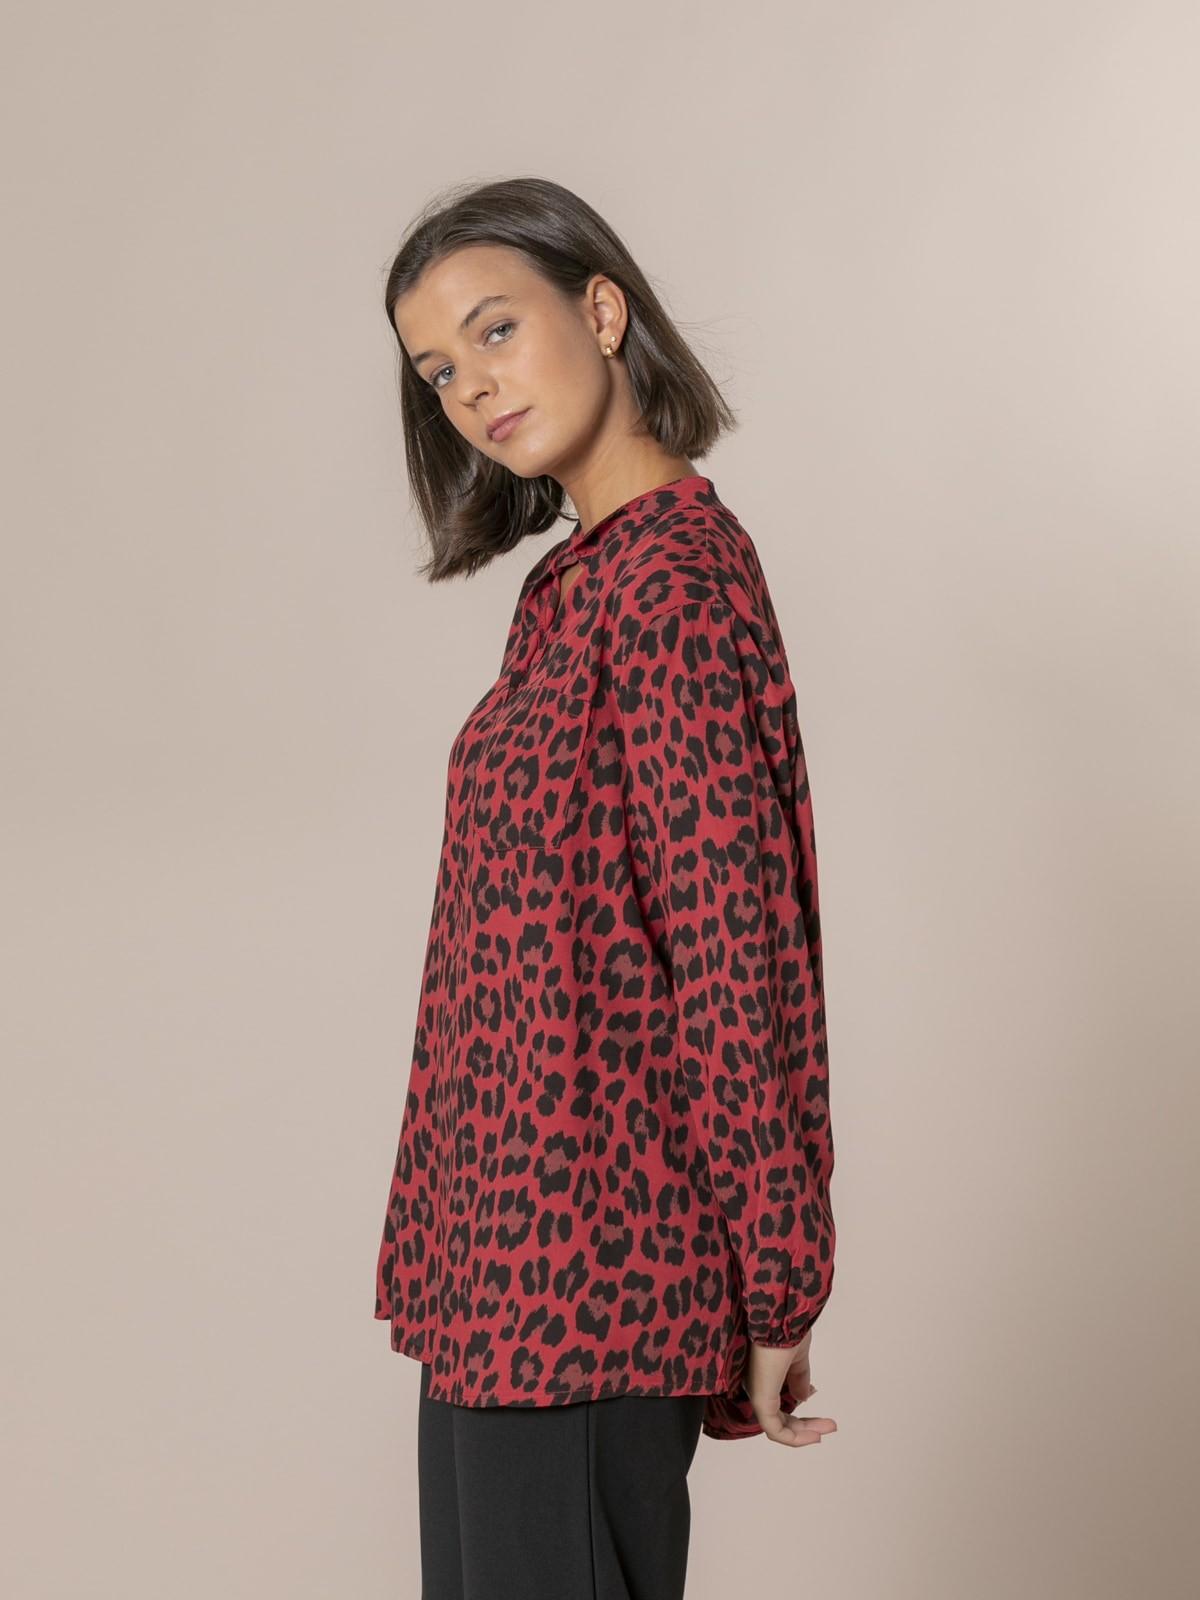 Camisa mujer botones animal print Rojo